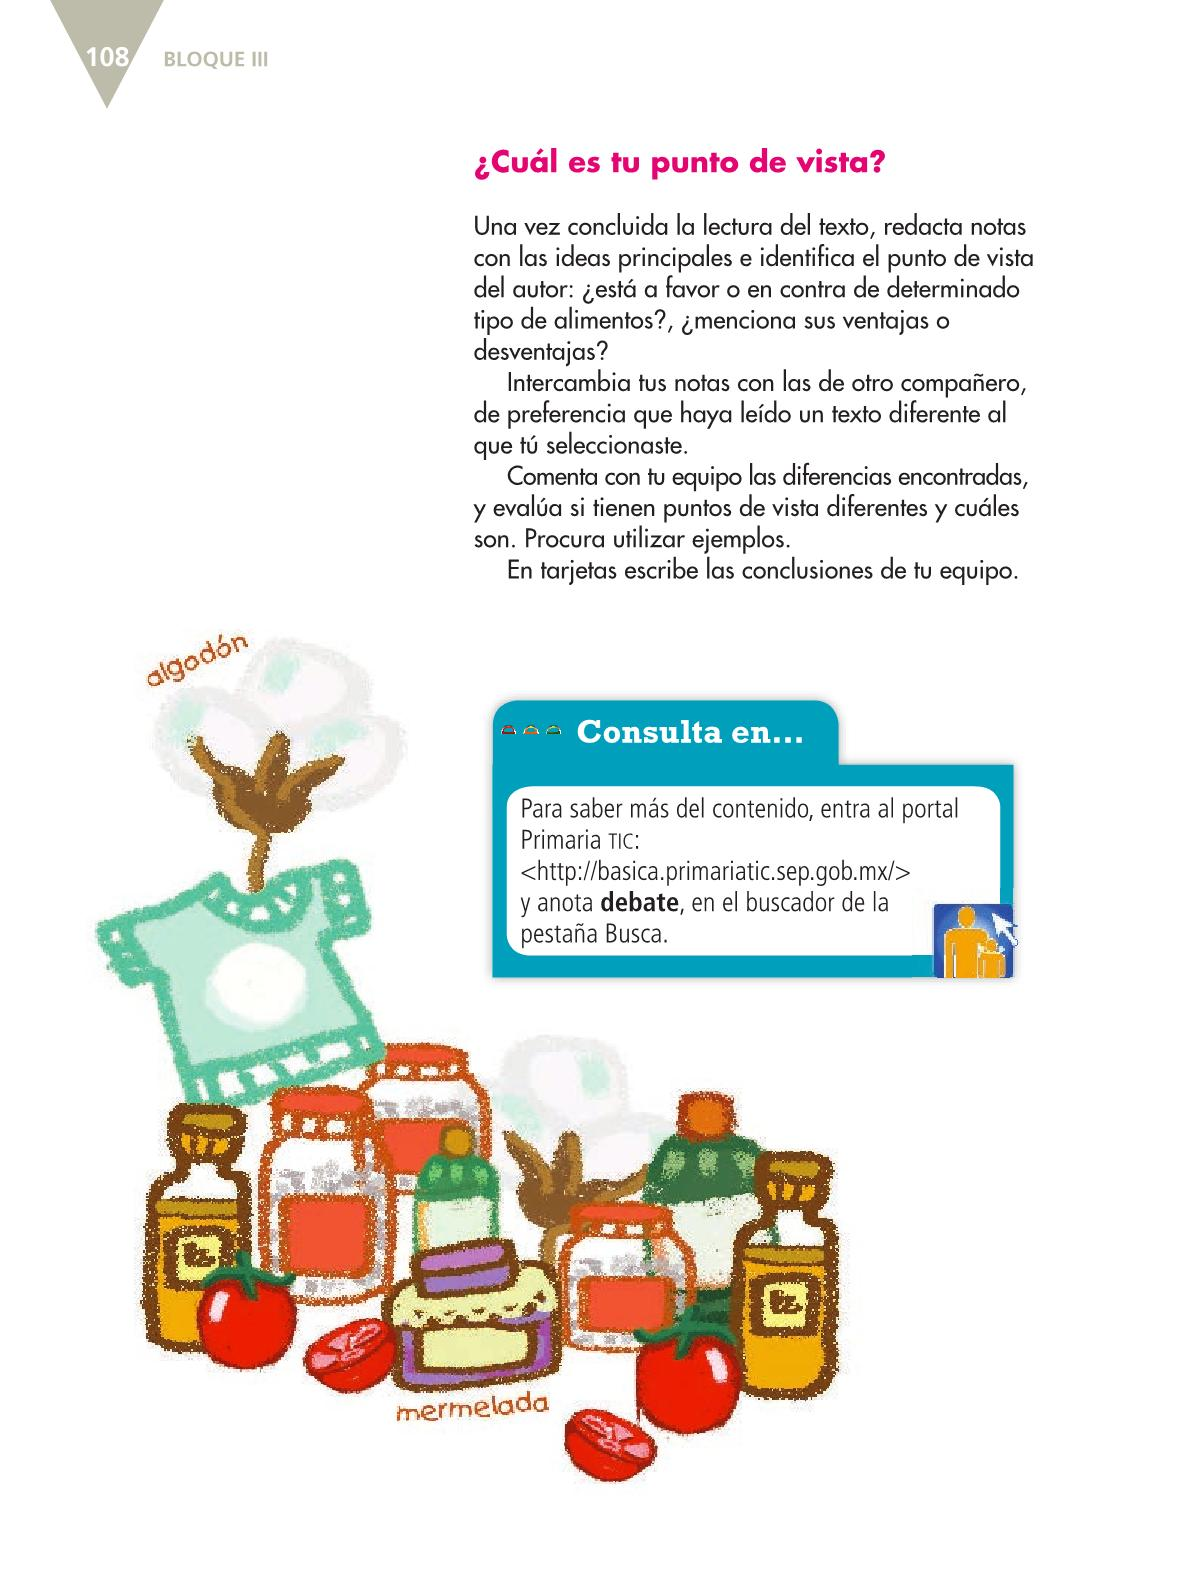 Español Libro para el alumnoquintoPagina 108